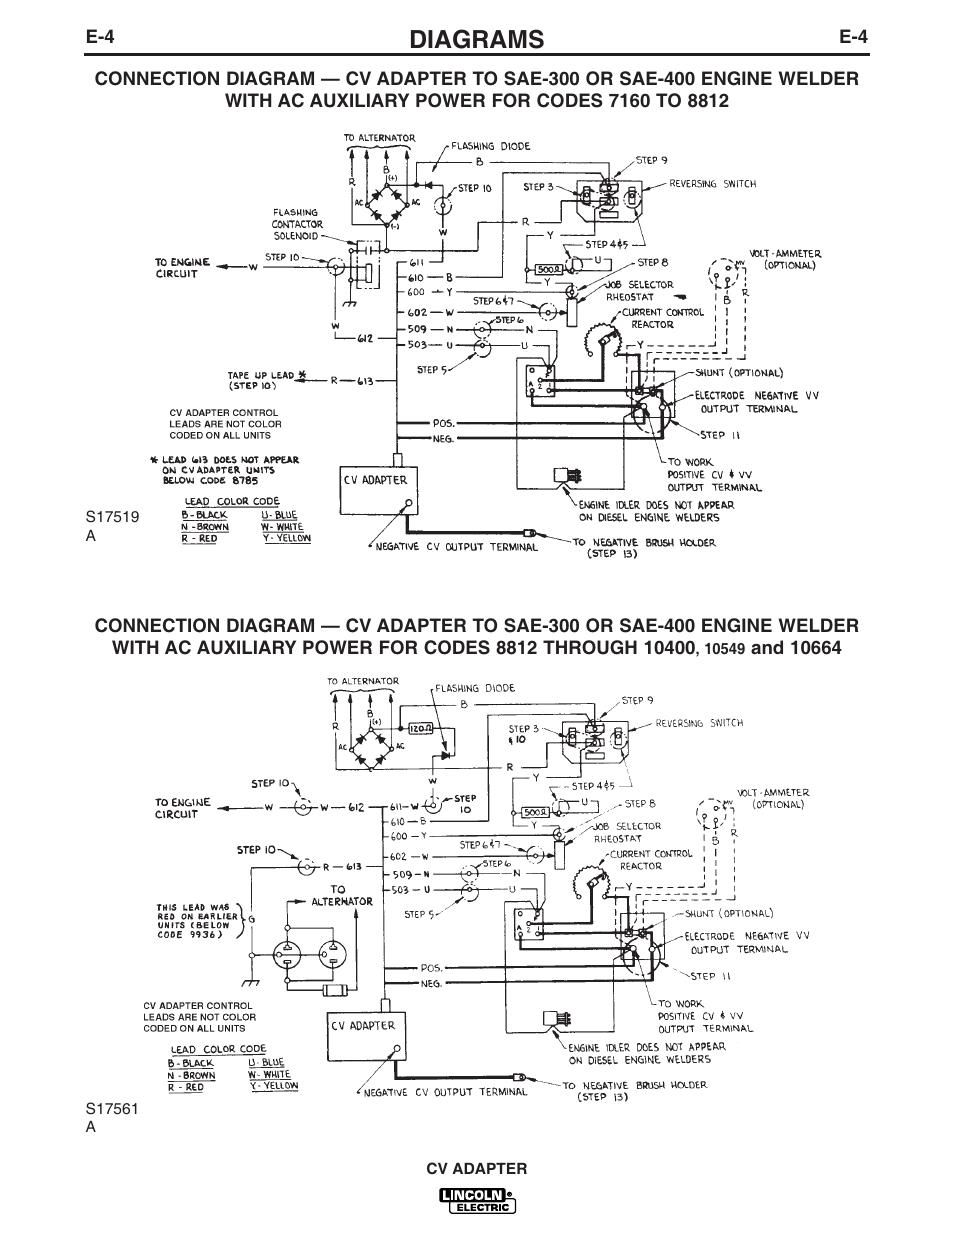 medium resolution of wiring diagram lincoln sae 400 lincoln dc 400 welder lincoln sae 200 lincoln sae 400